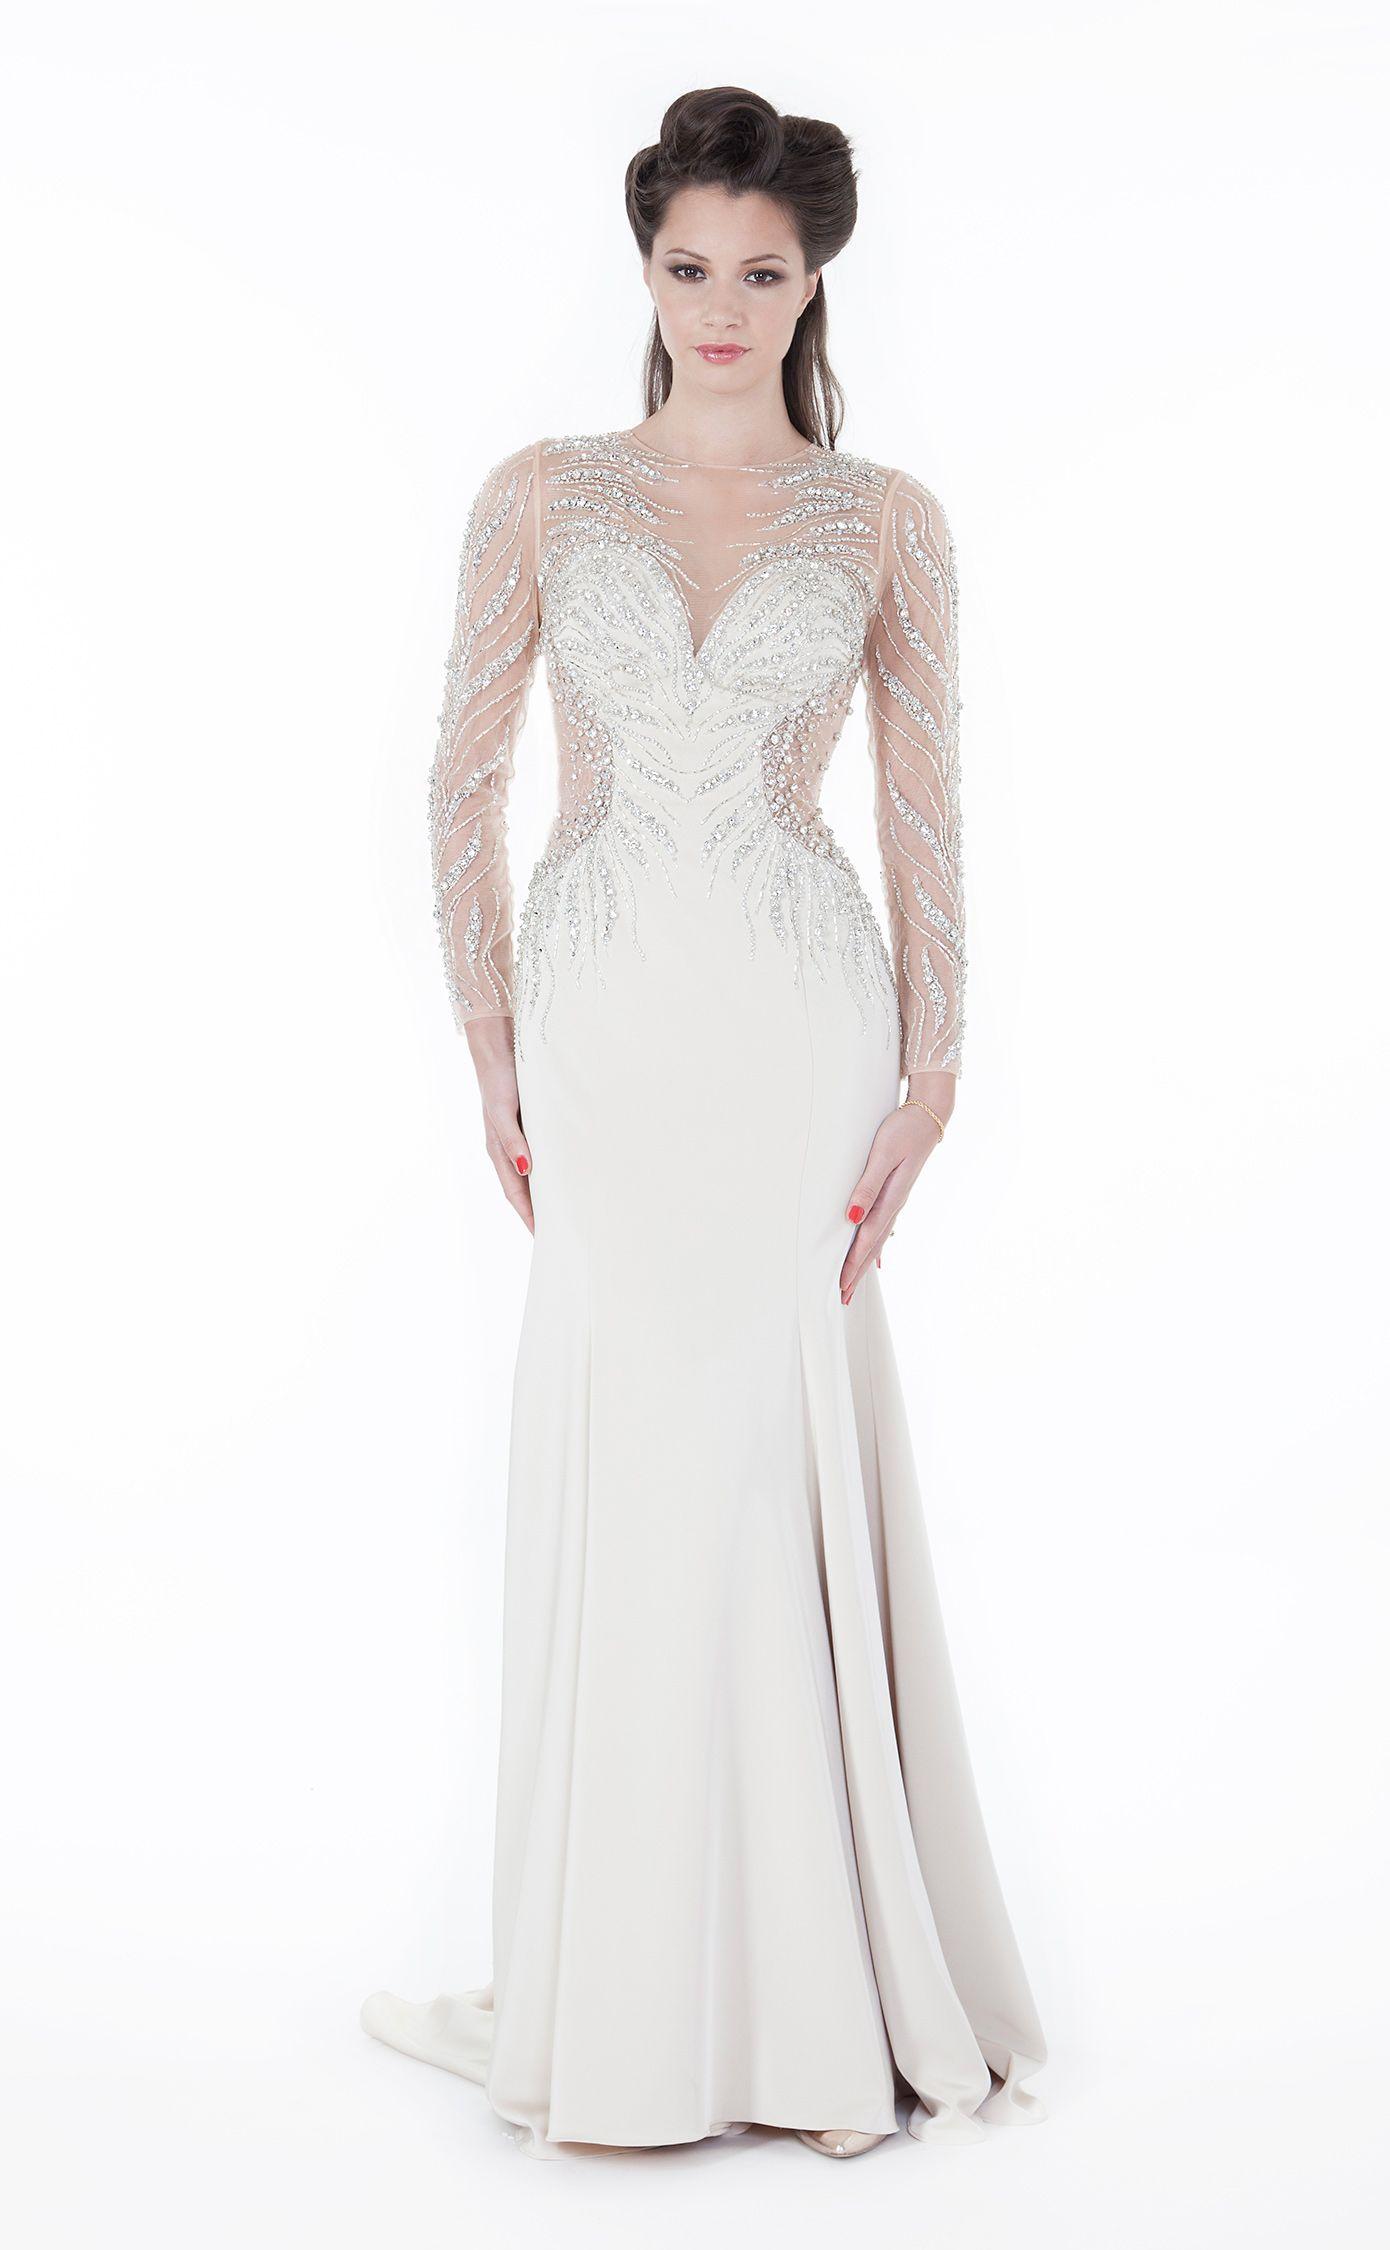 Pin by Deb on Wedding Dresses Wedding dresses, Crepe